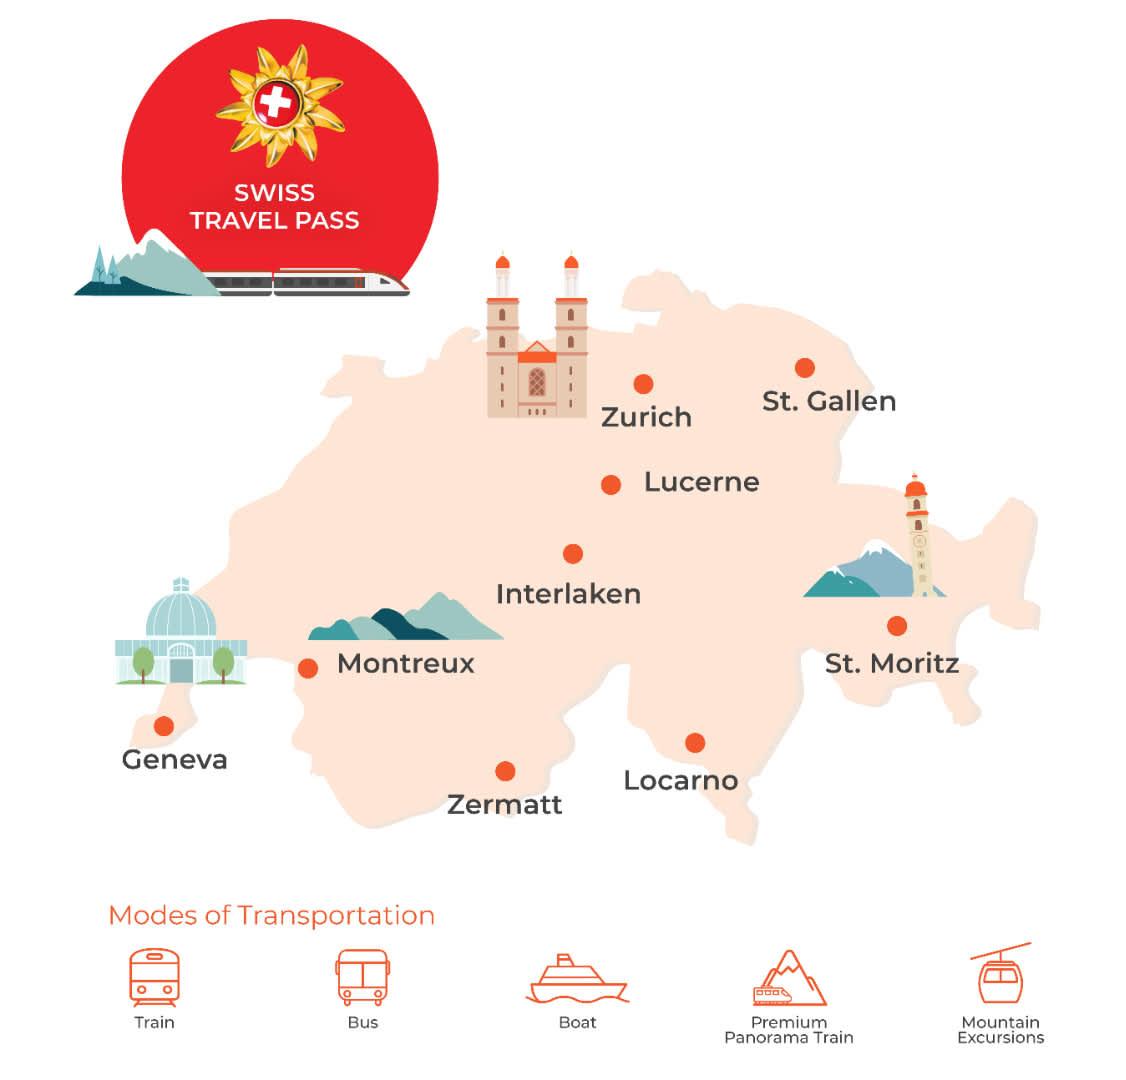 swiss travel pass map